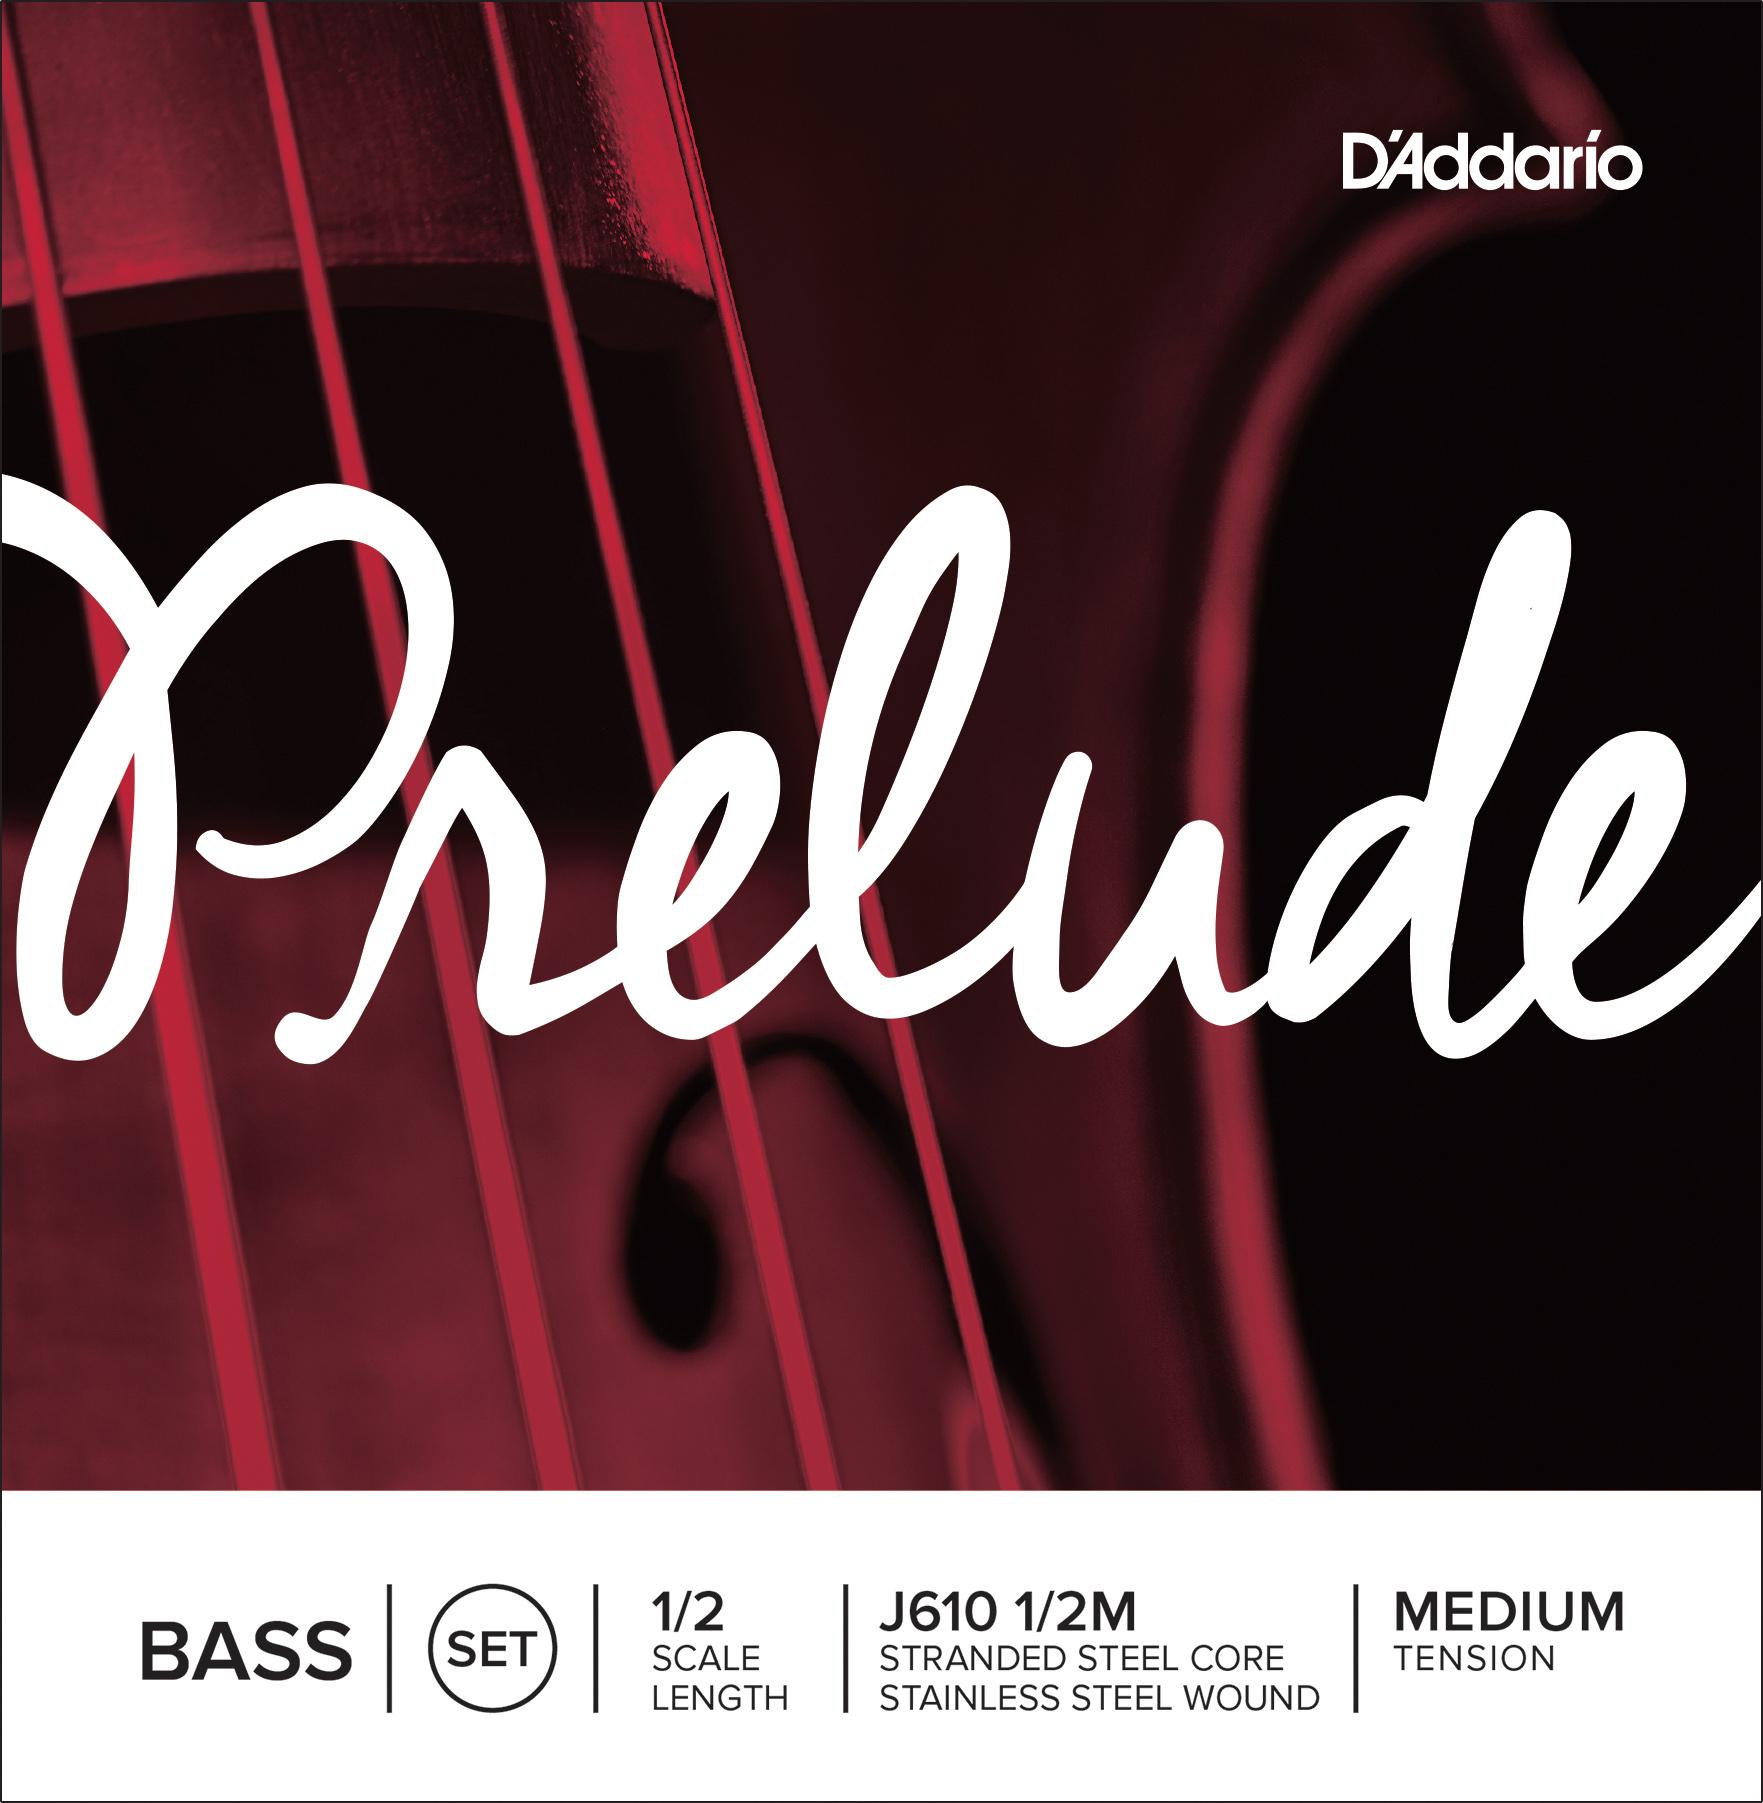 D'Addario Prelude Bass String Set 1/2 Scale Medium Tension